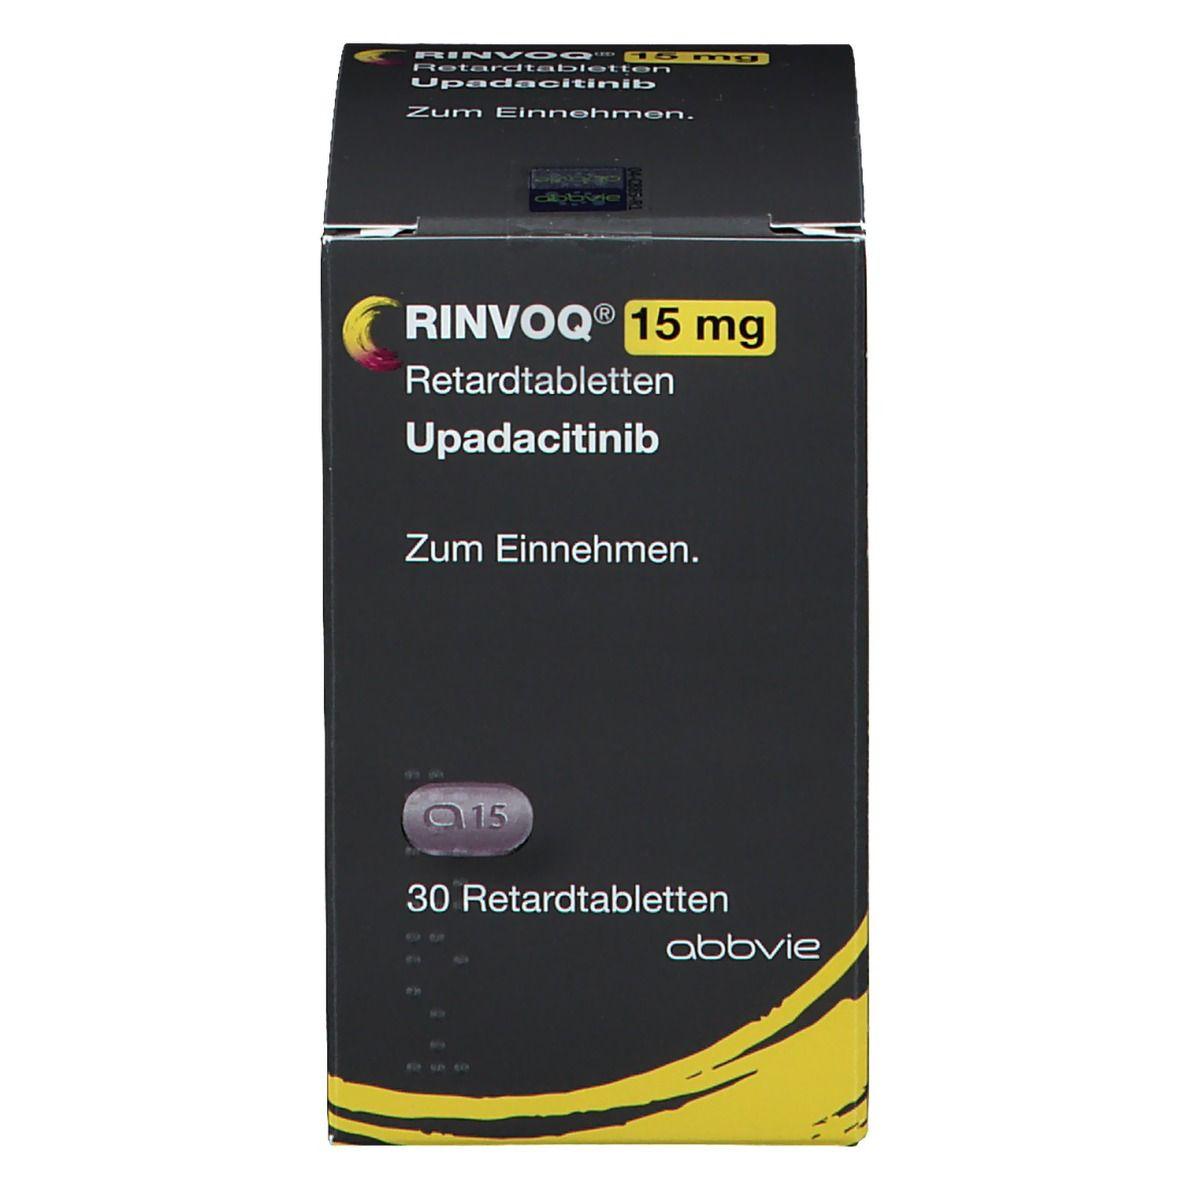 RINVOQ 15 mg Retardtabletten